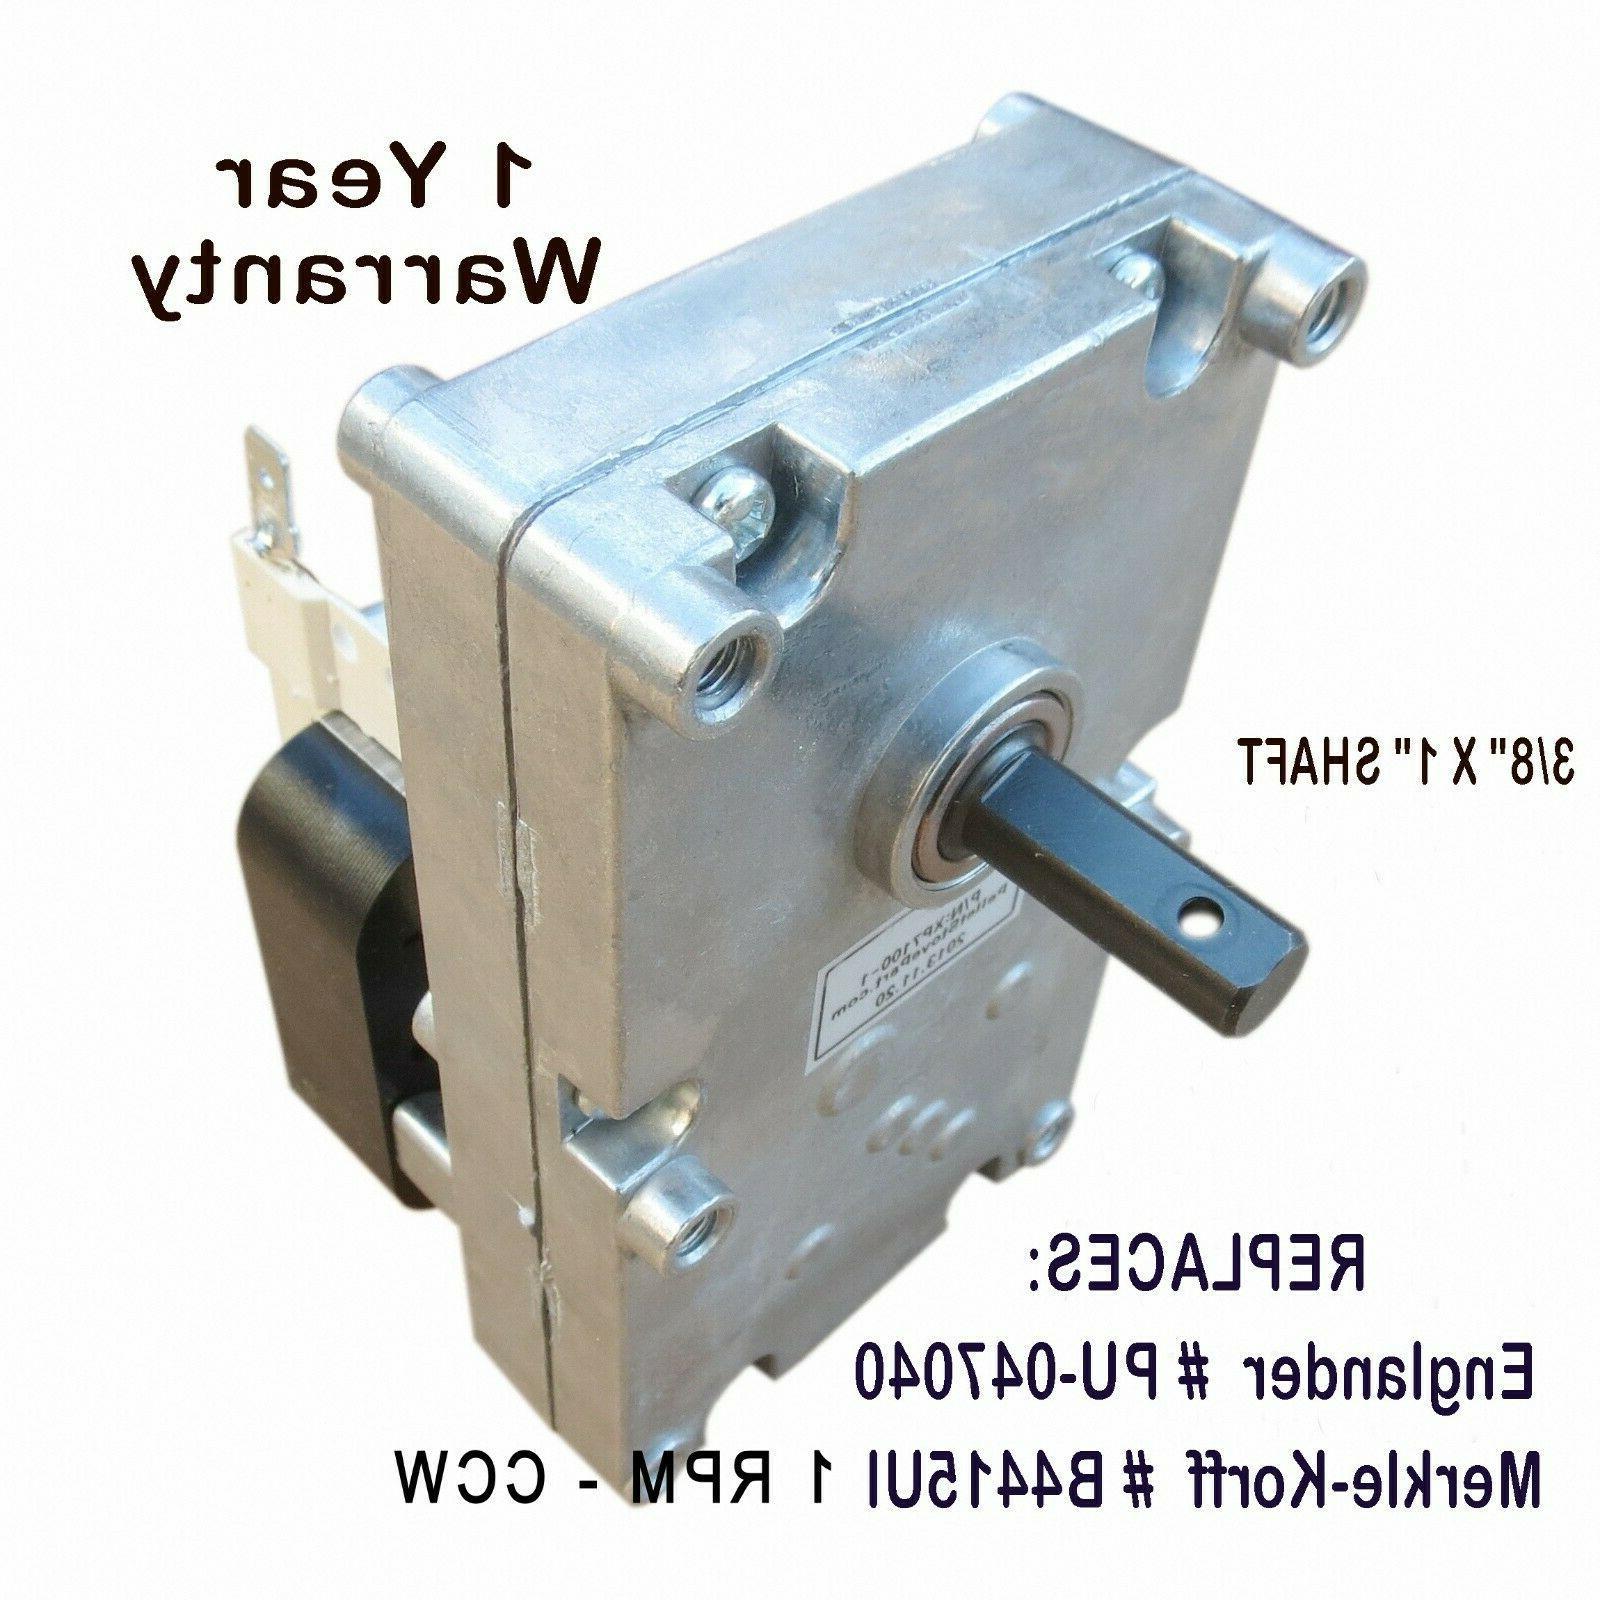 englander pellet stove auger motor xp7100 w